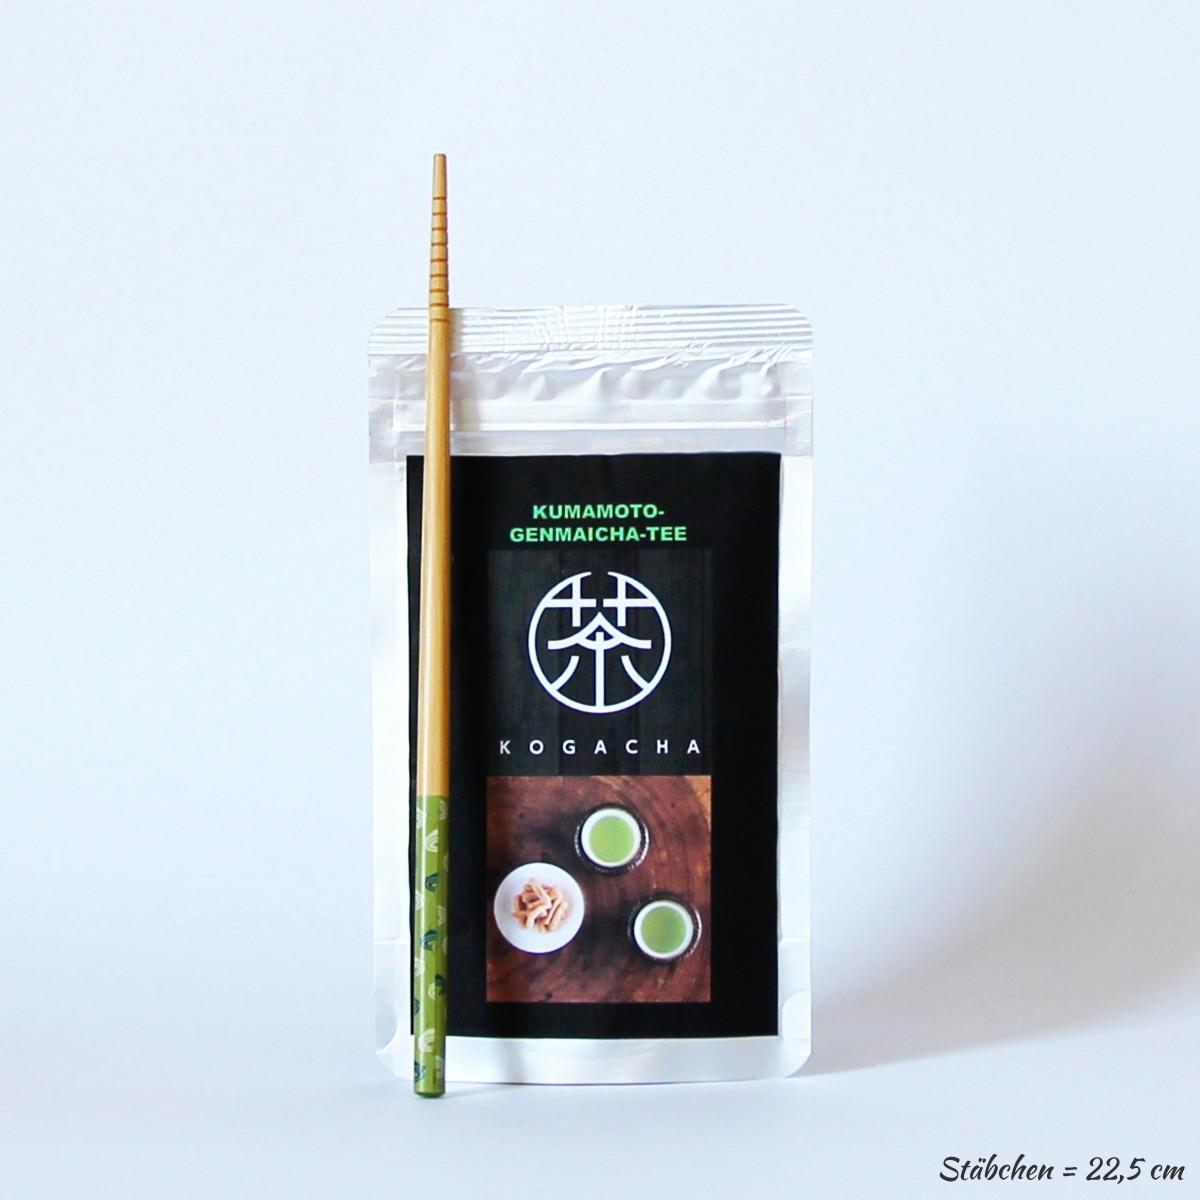 Genmaicha 50g (japanischer Bio-Grüntee mit Reis aus Kumamoto), KOGACHA